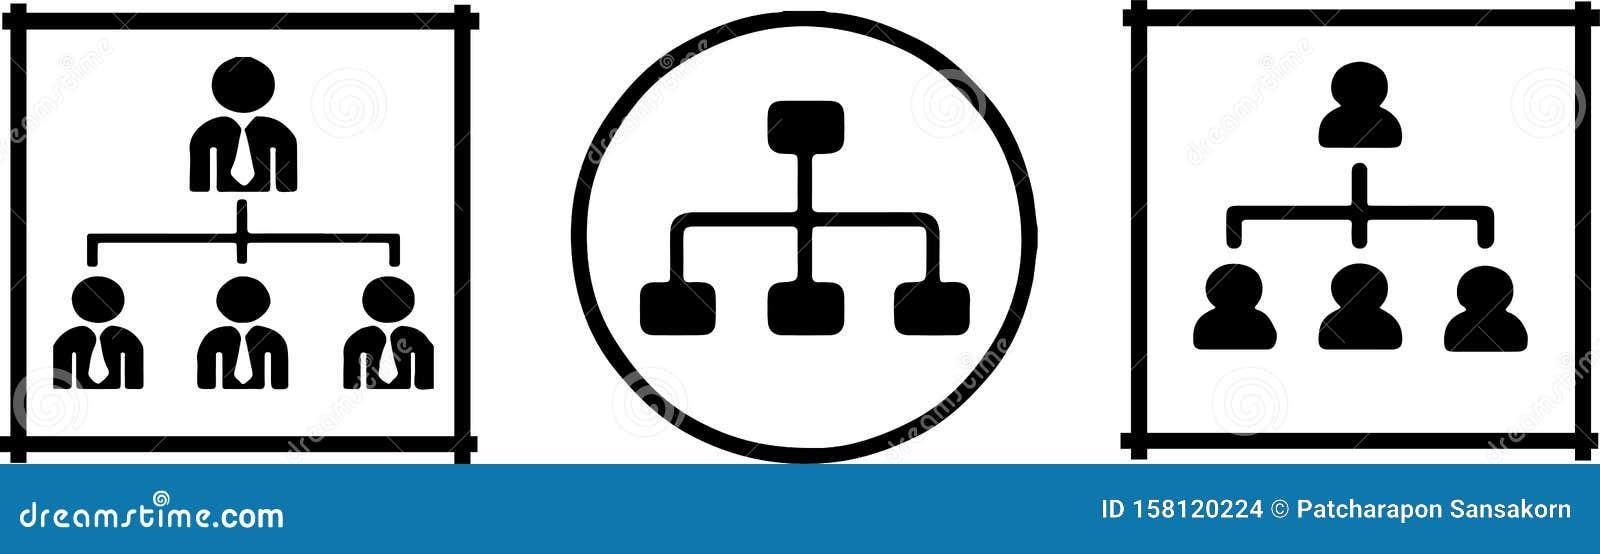 Organizational structure icon on white background